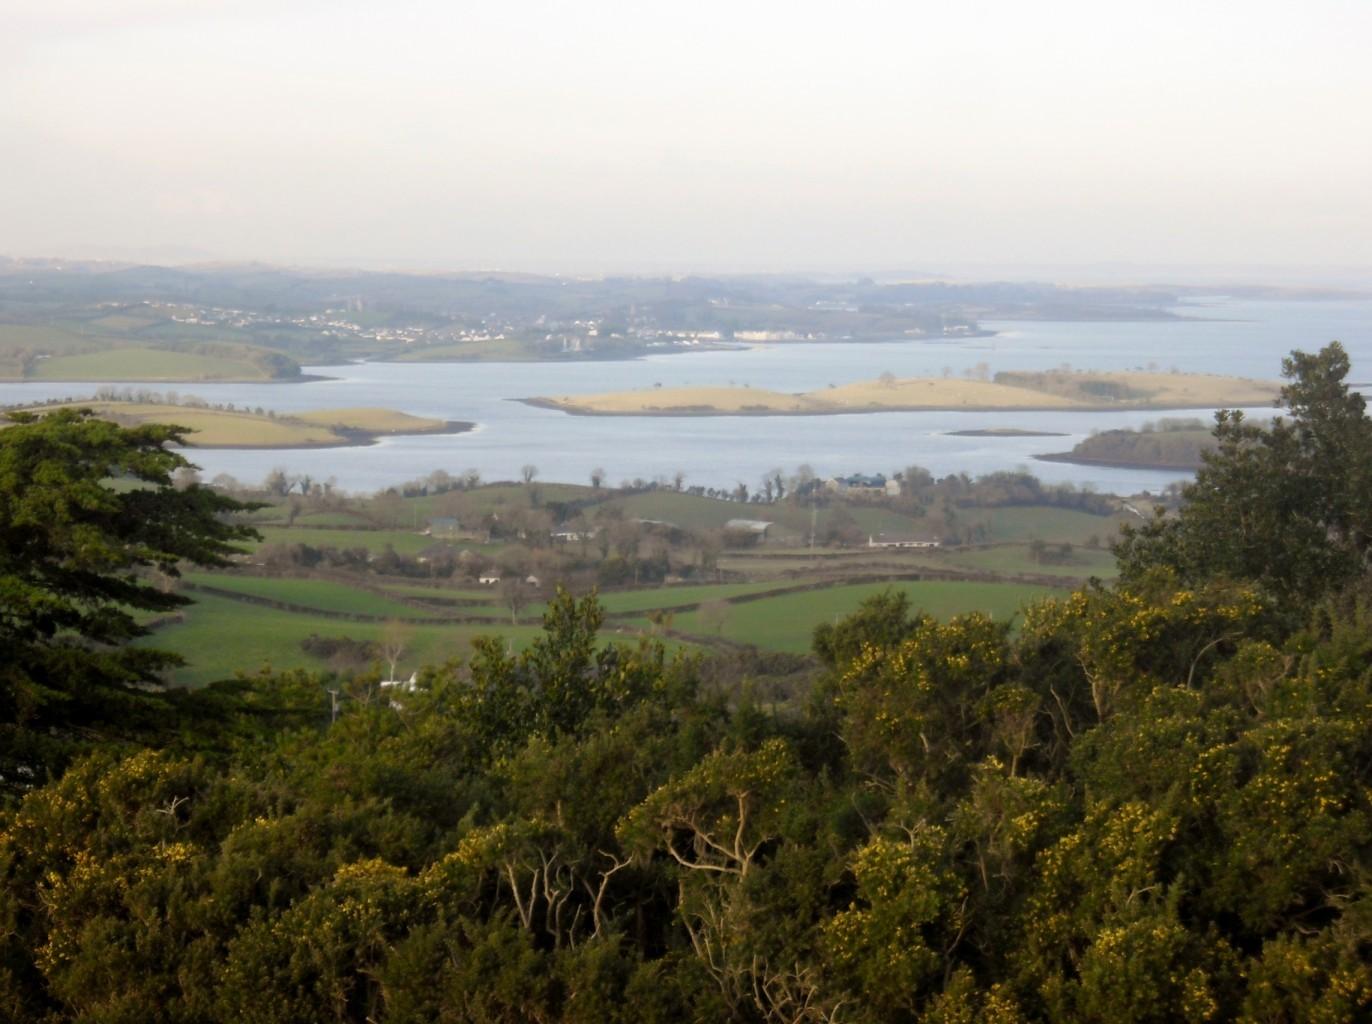 Saint Patrick's tour of Ireland